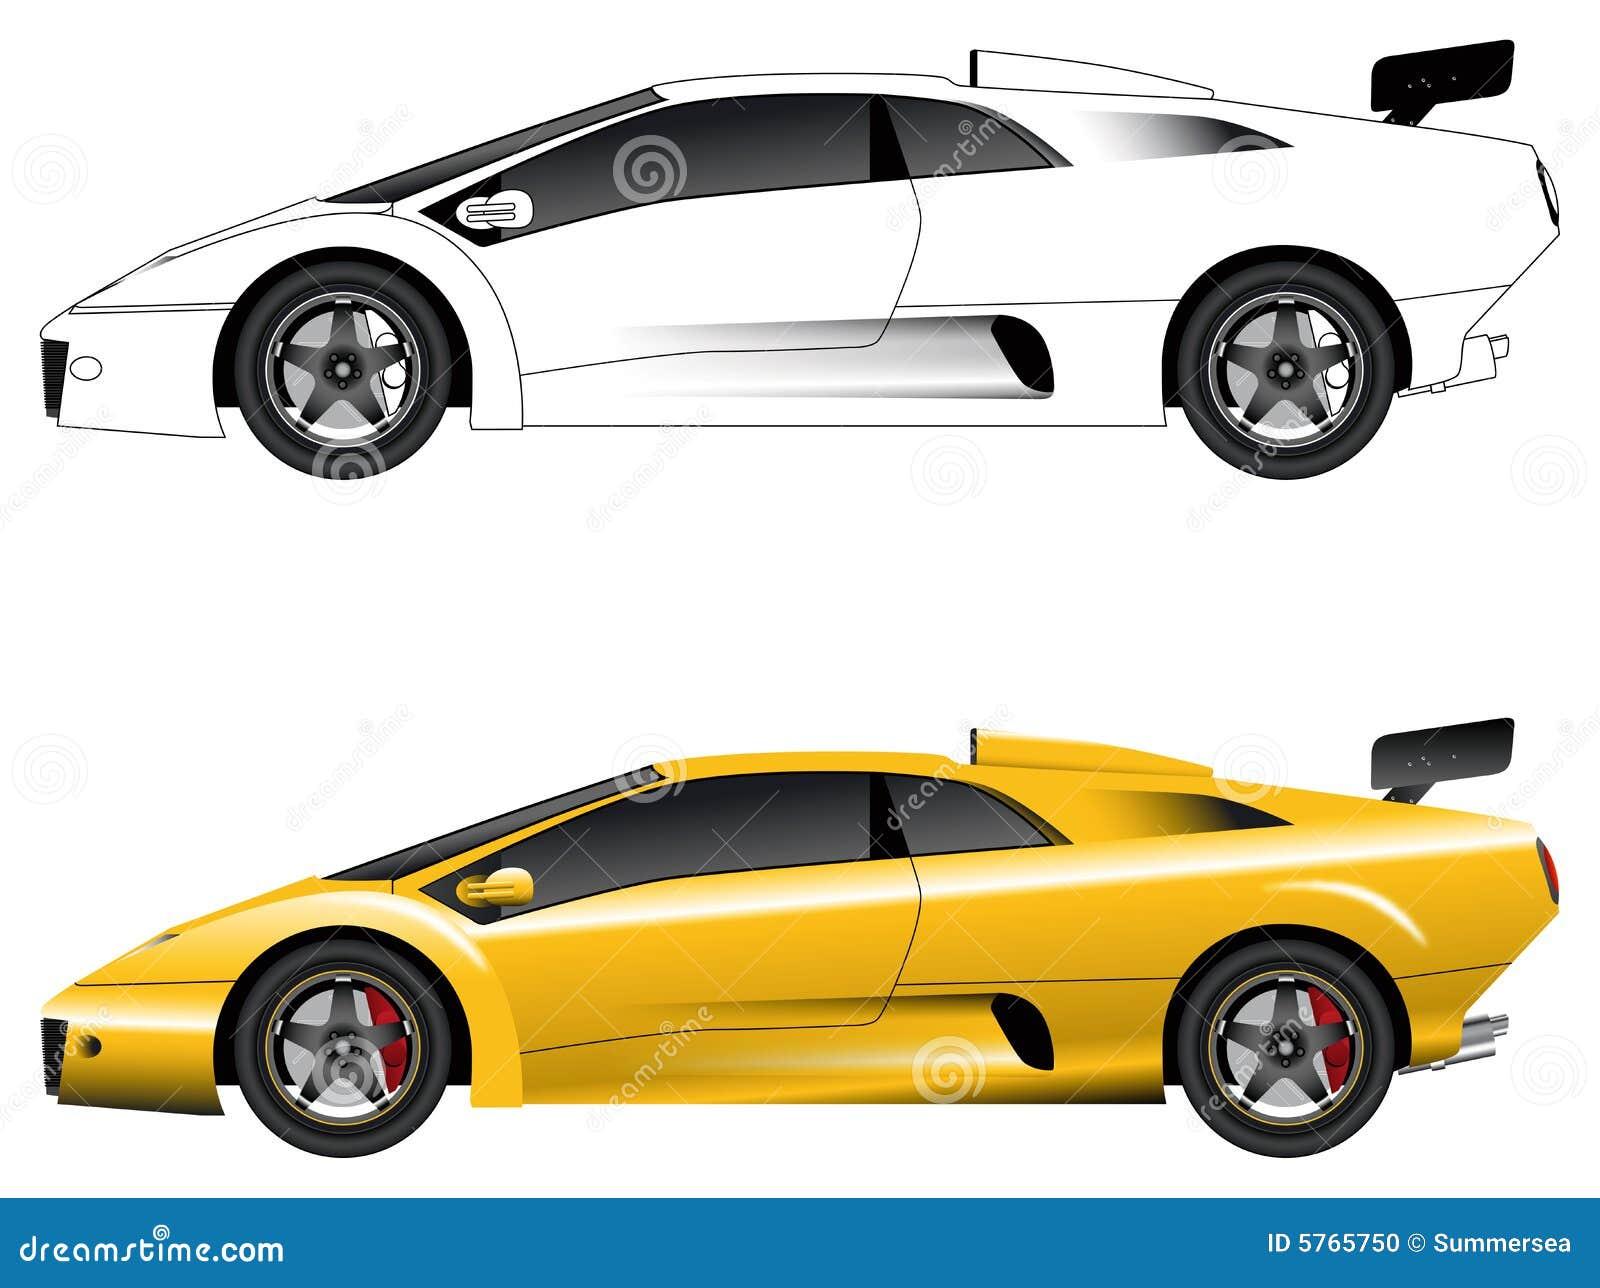 Generic Sports Car Vector Stock Vector Illustration Of Automotive